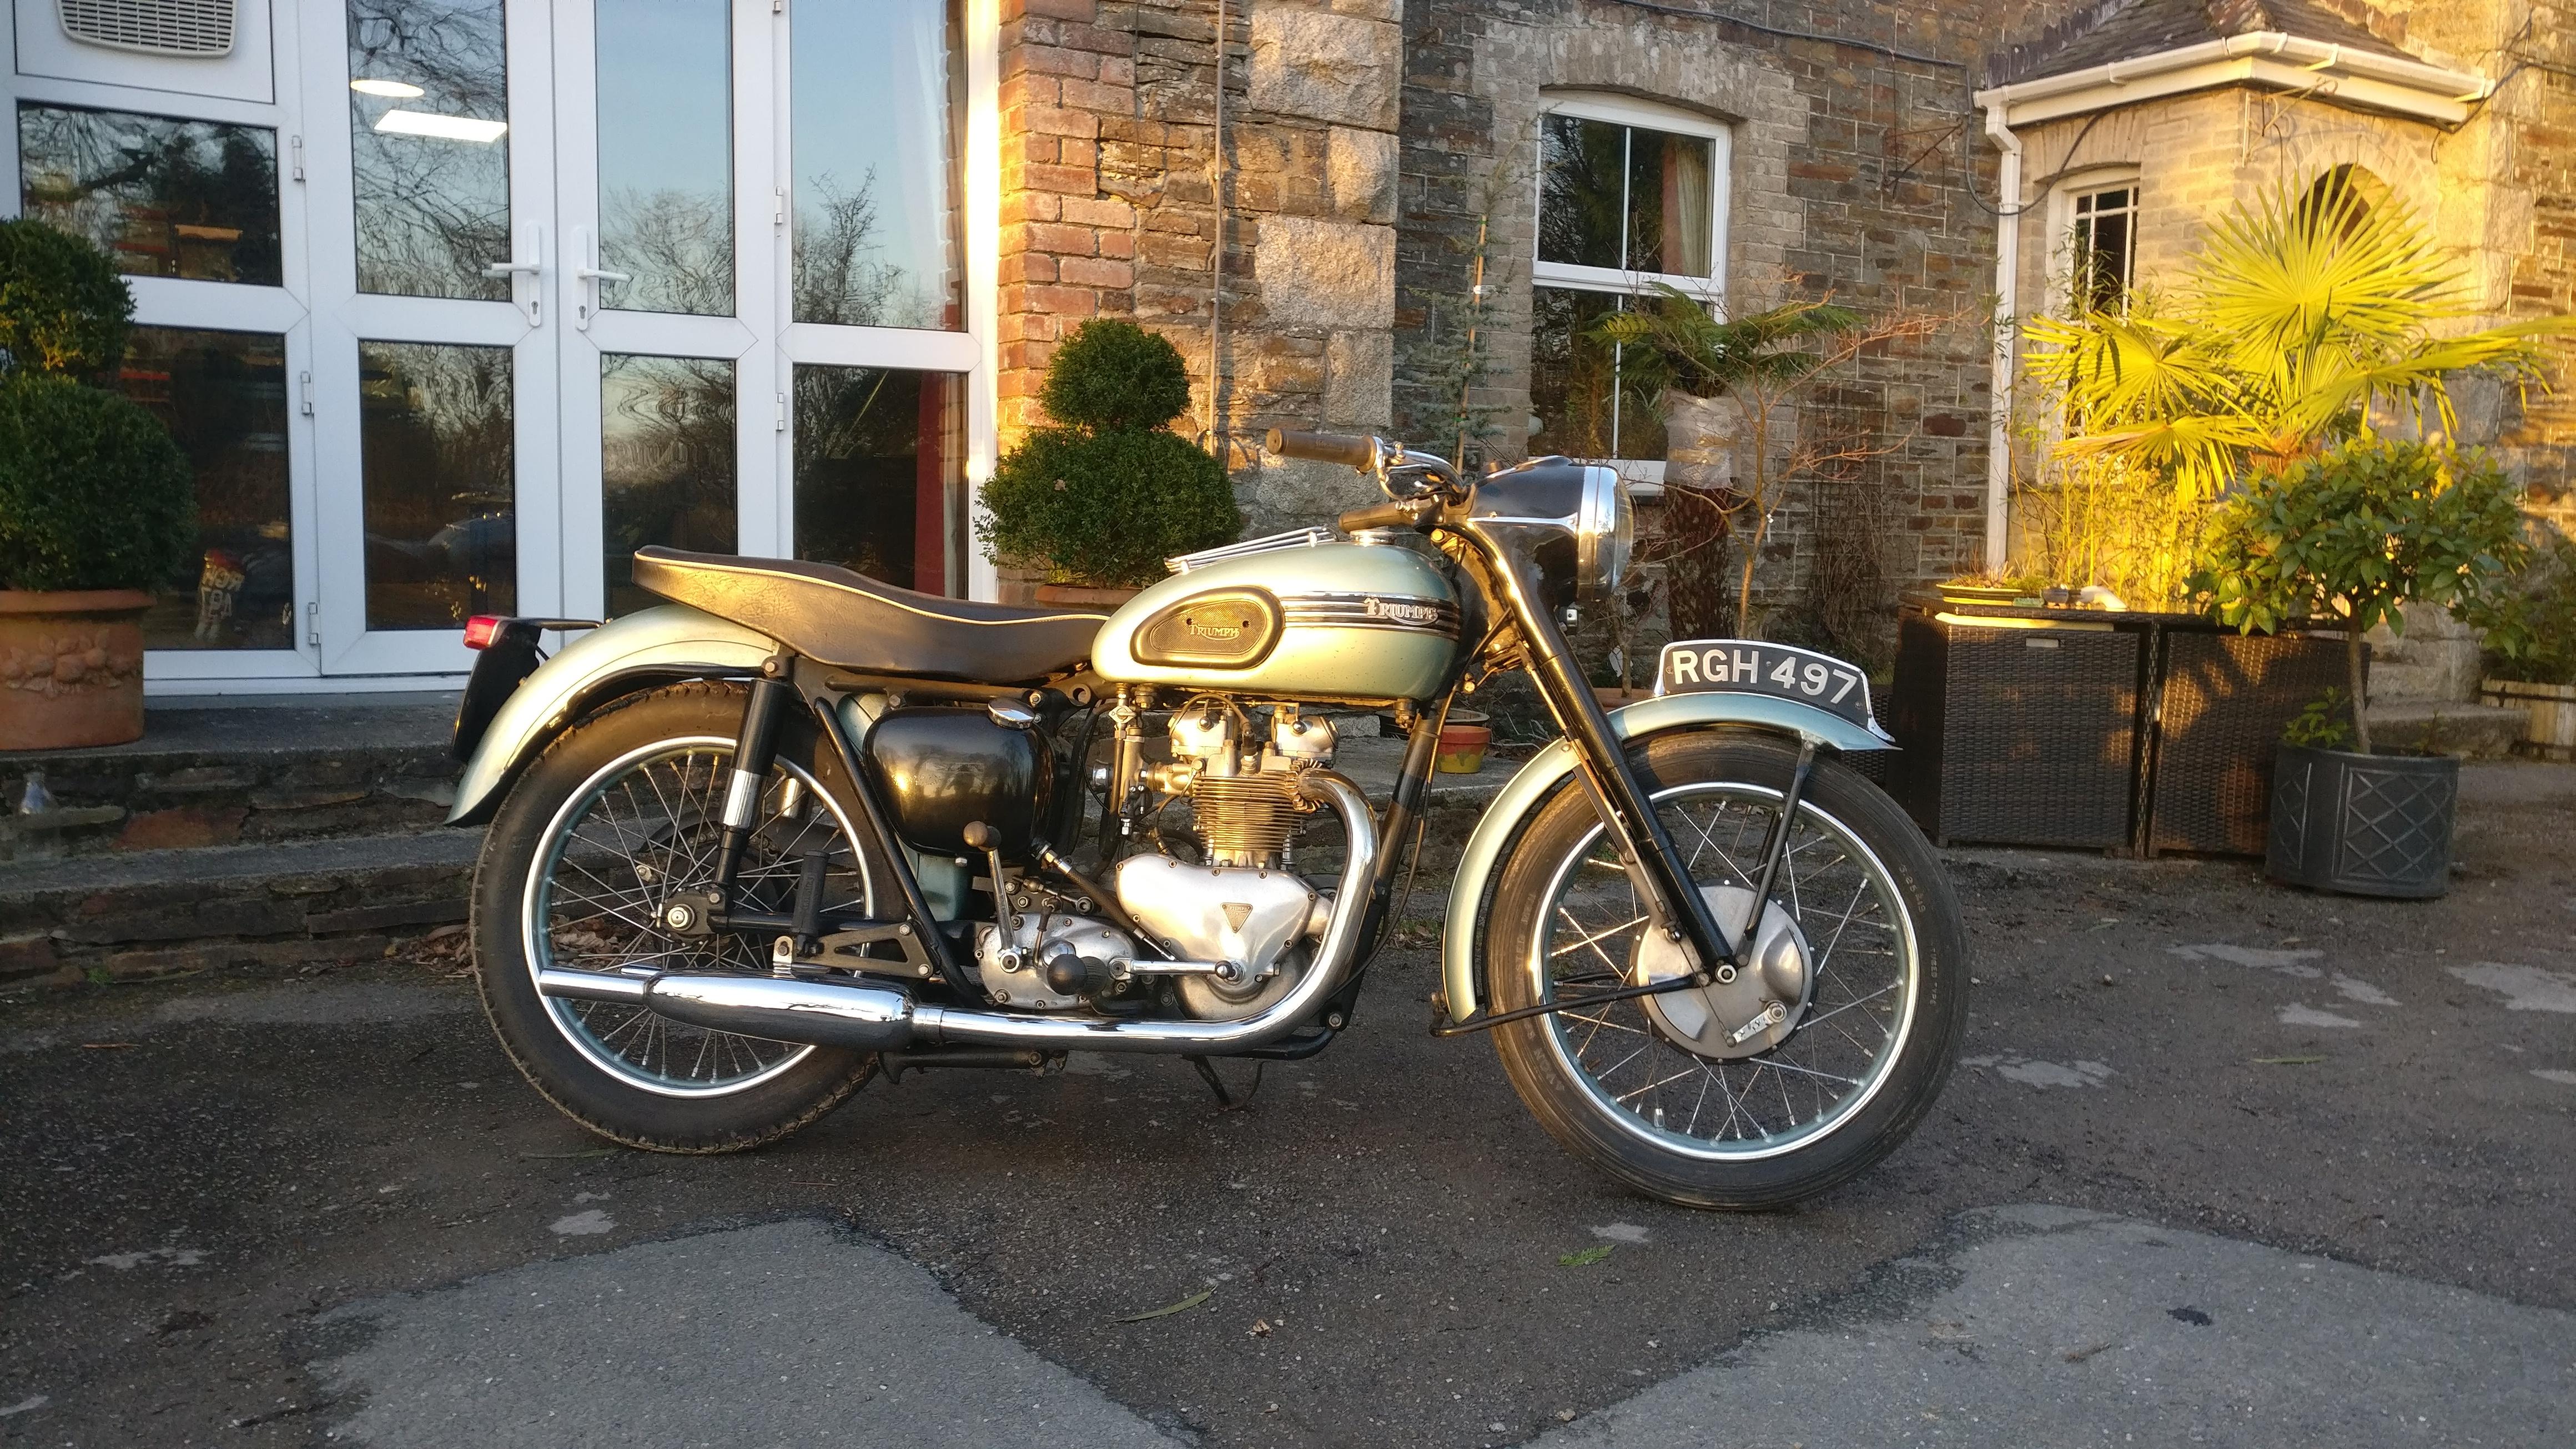 Monty's Classic Motorcycles